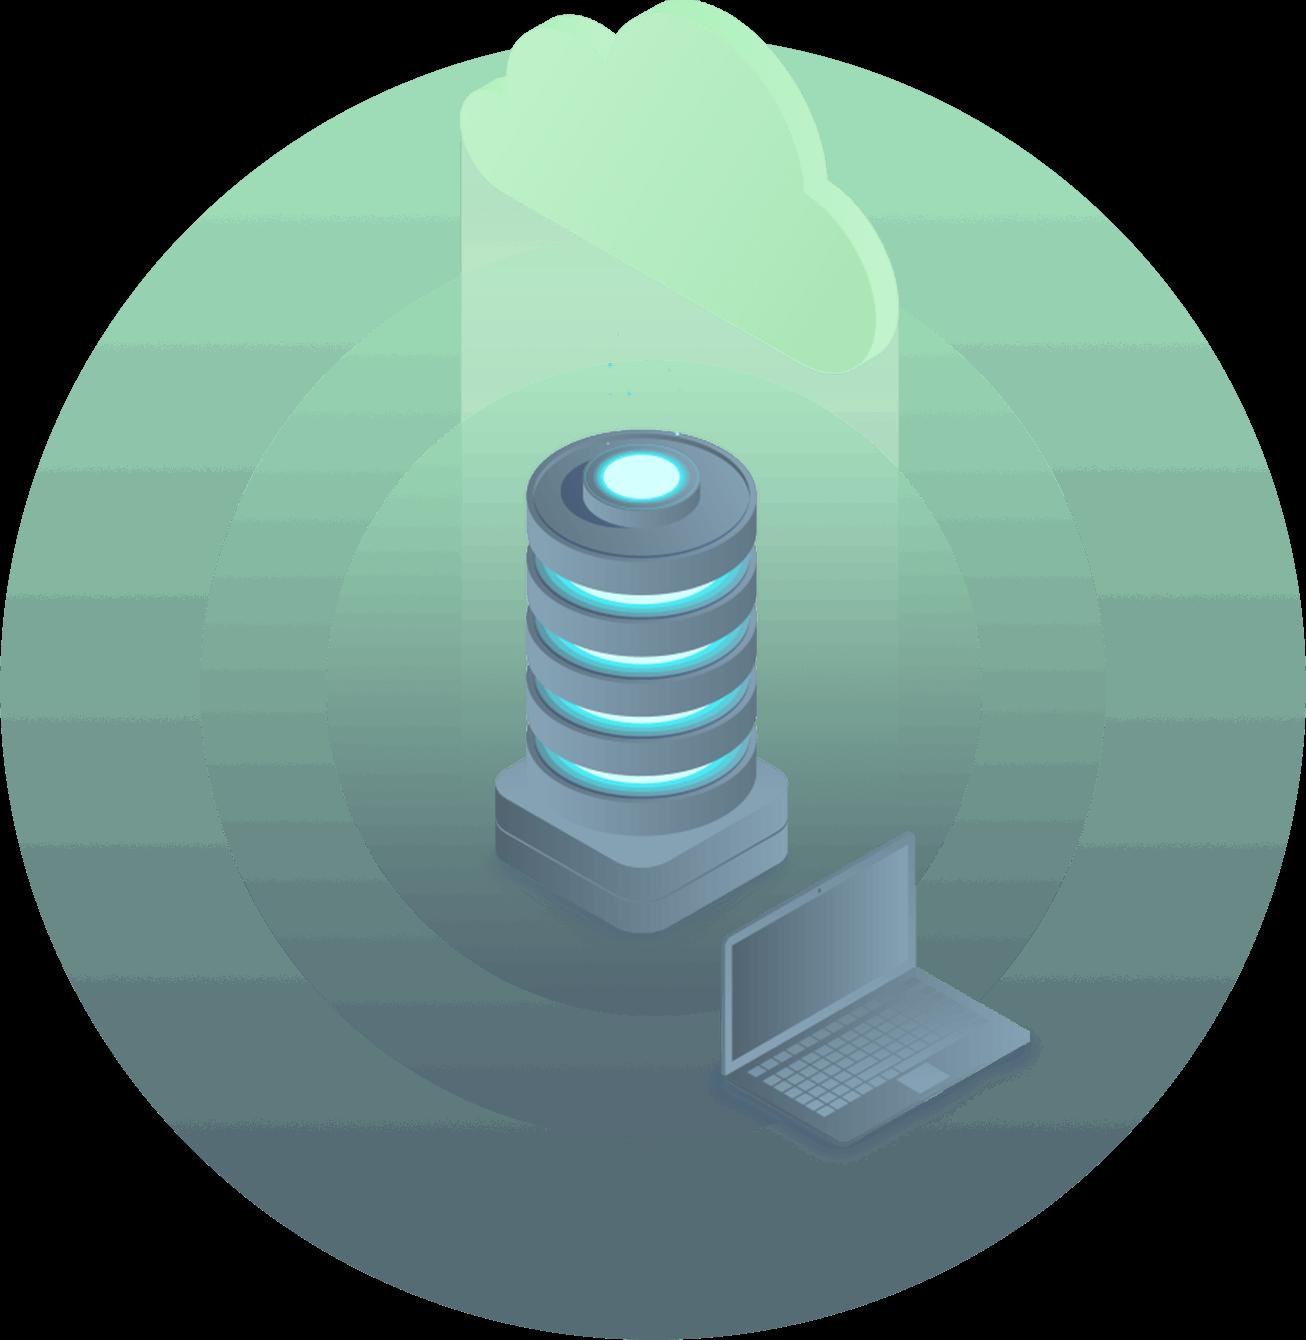 cloud server with laptop illustration